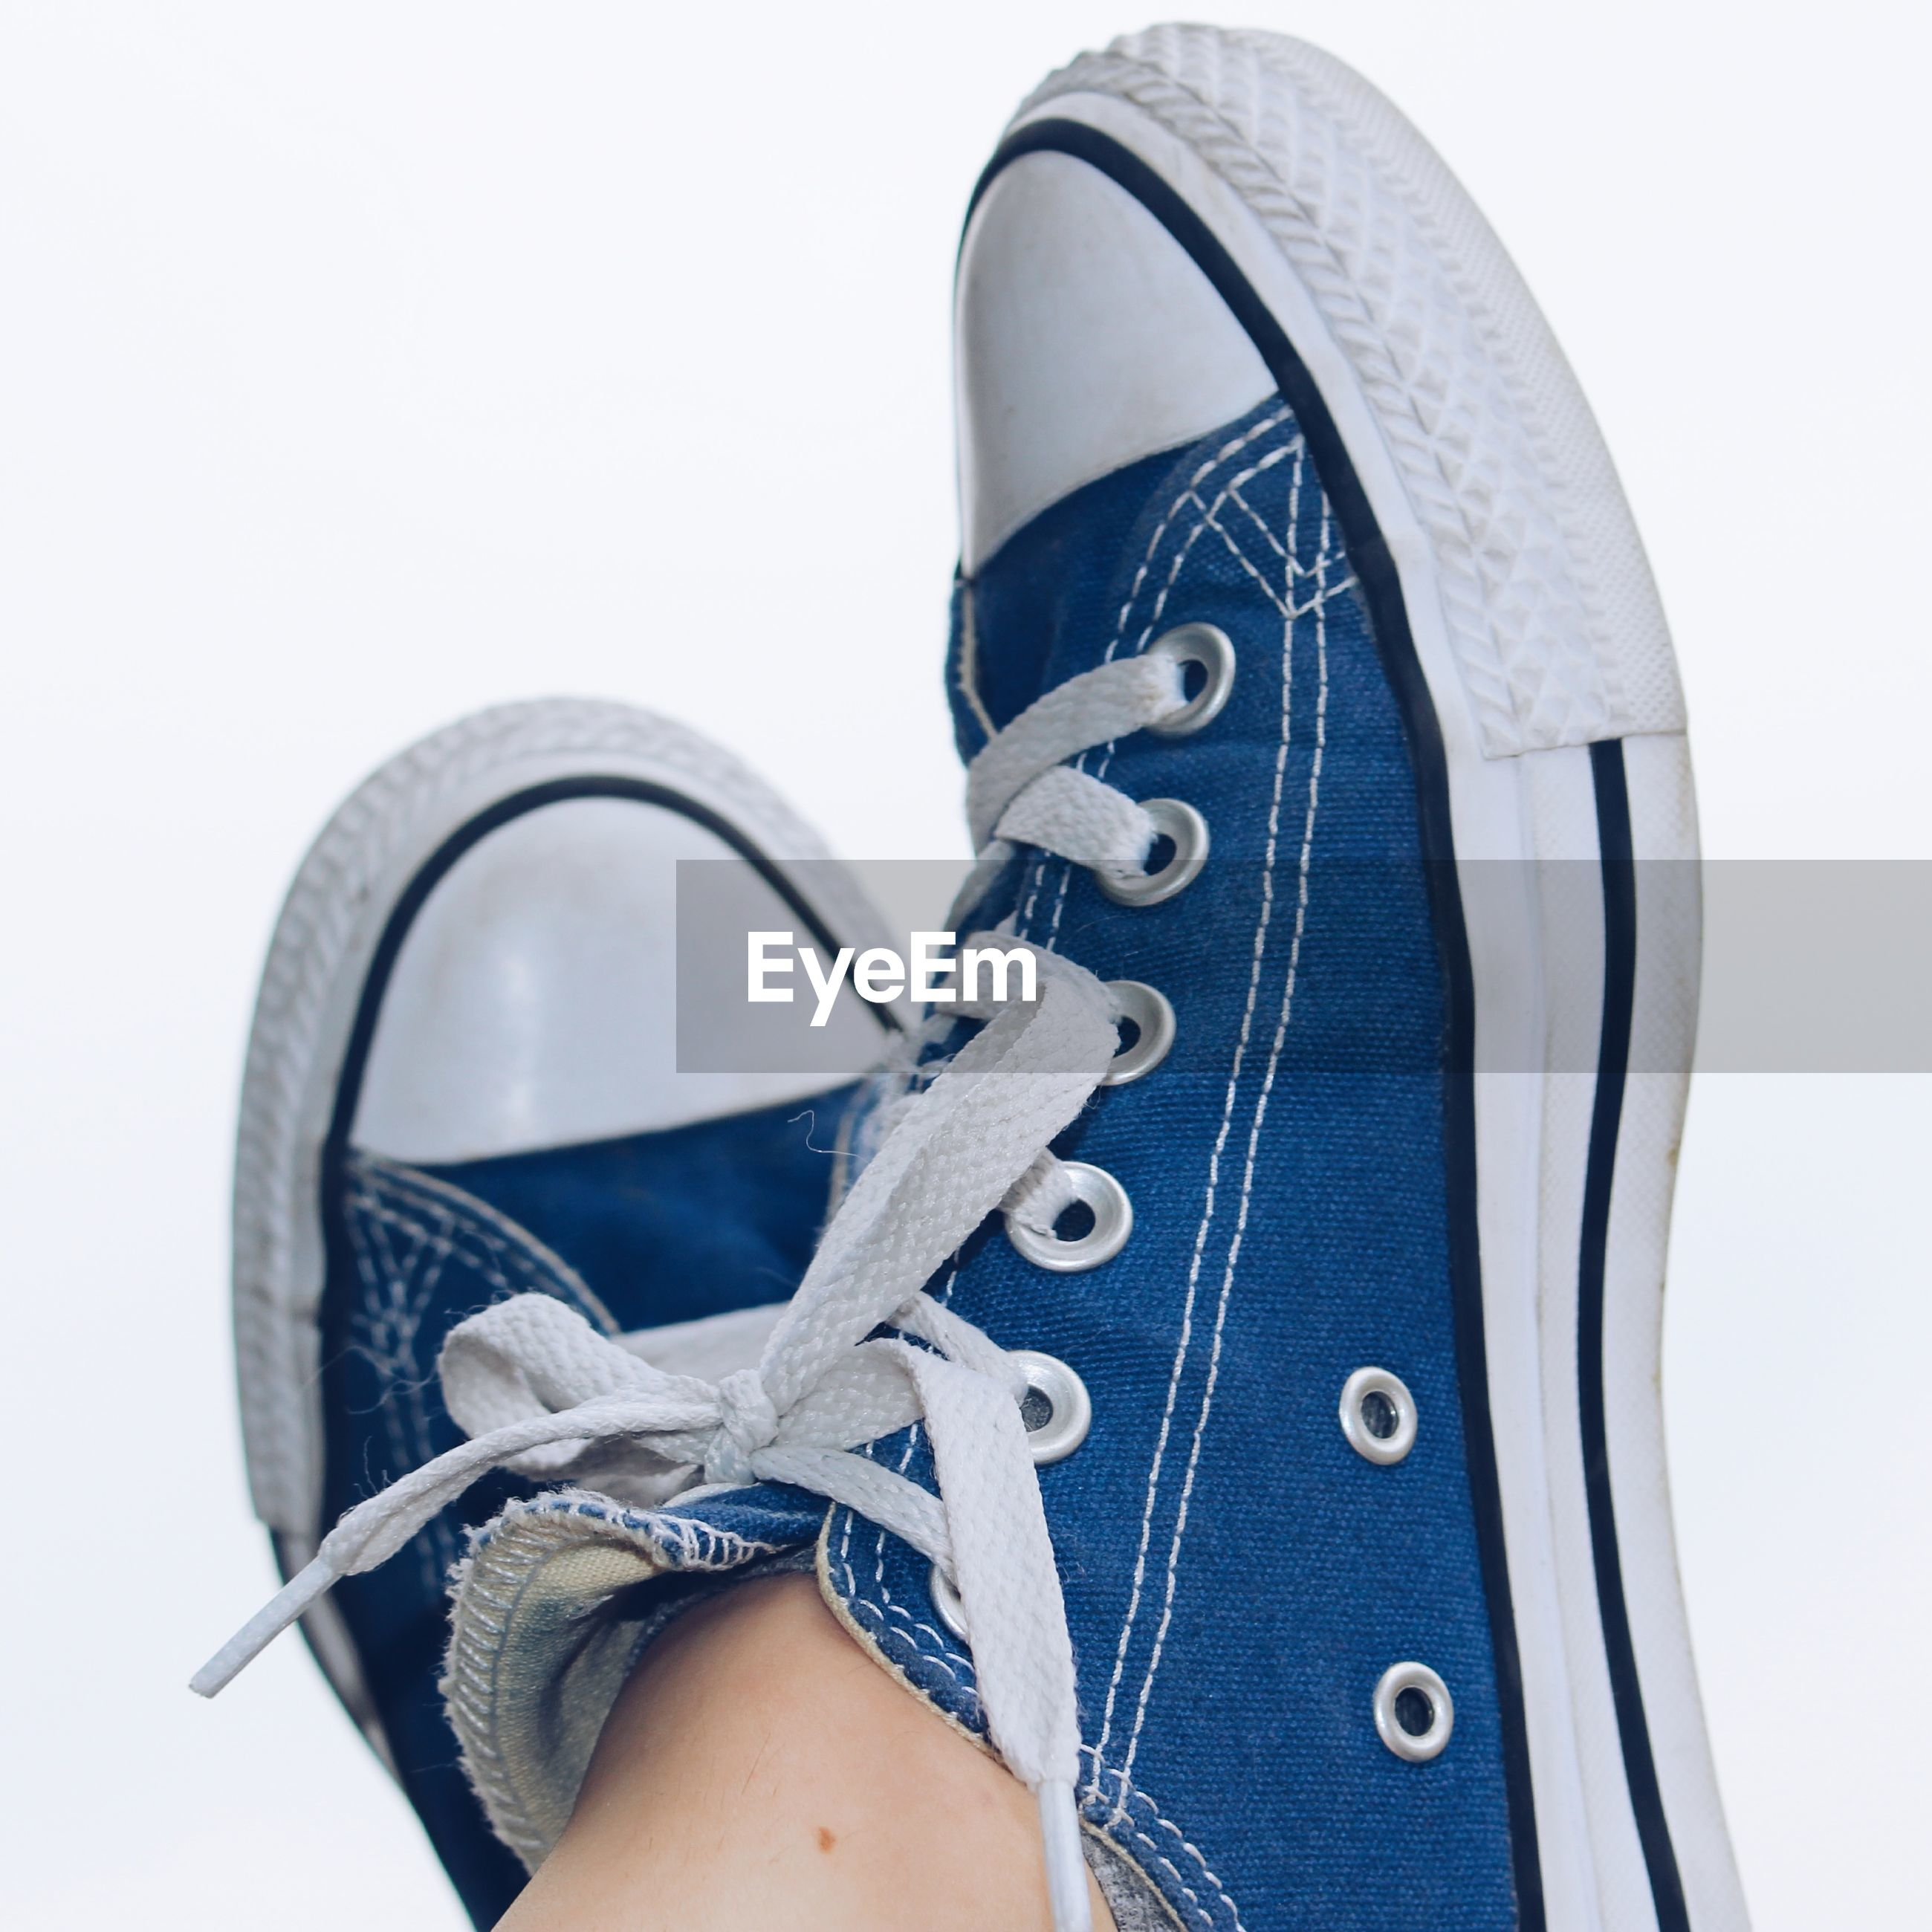 person, shoe, personal perspective, low section, lifestyles, part of, men, close-up, denim, canvas shoe, wristwatch, human foot, studio shot